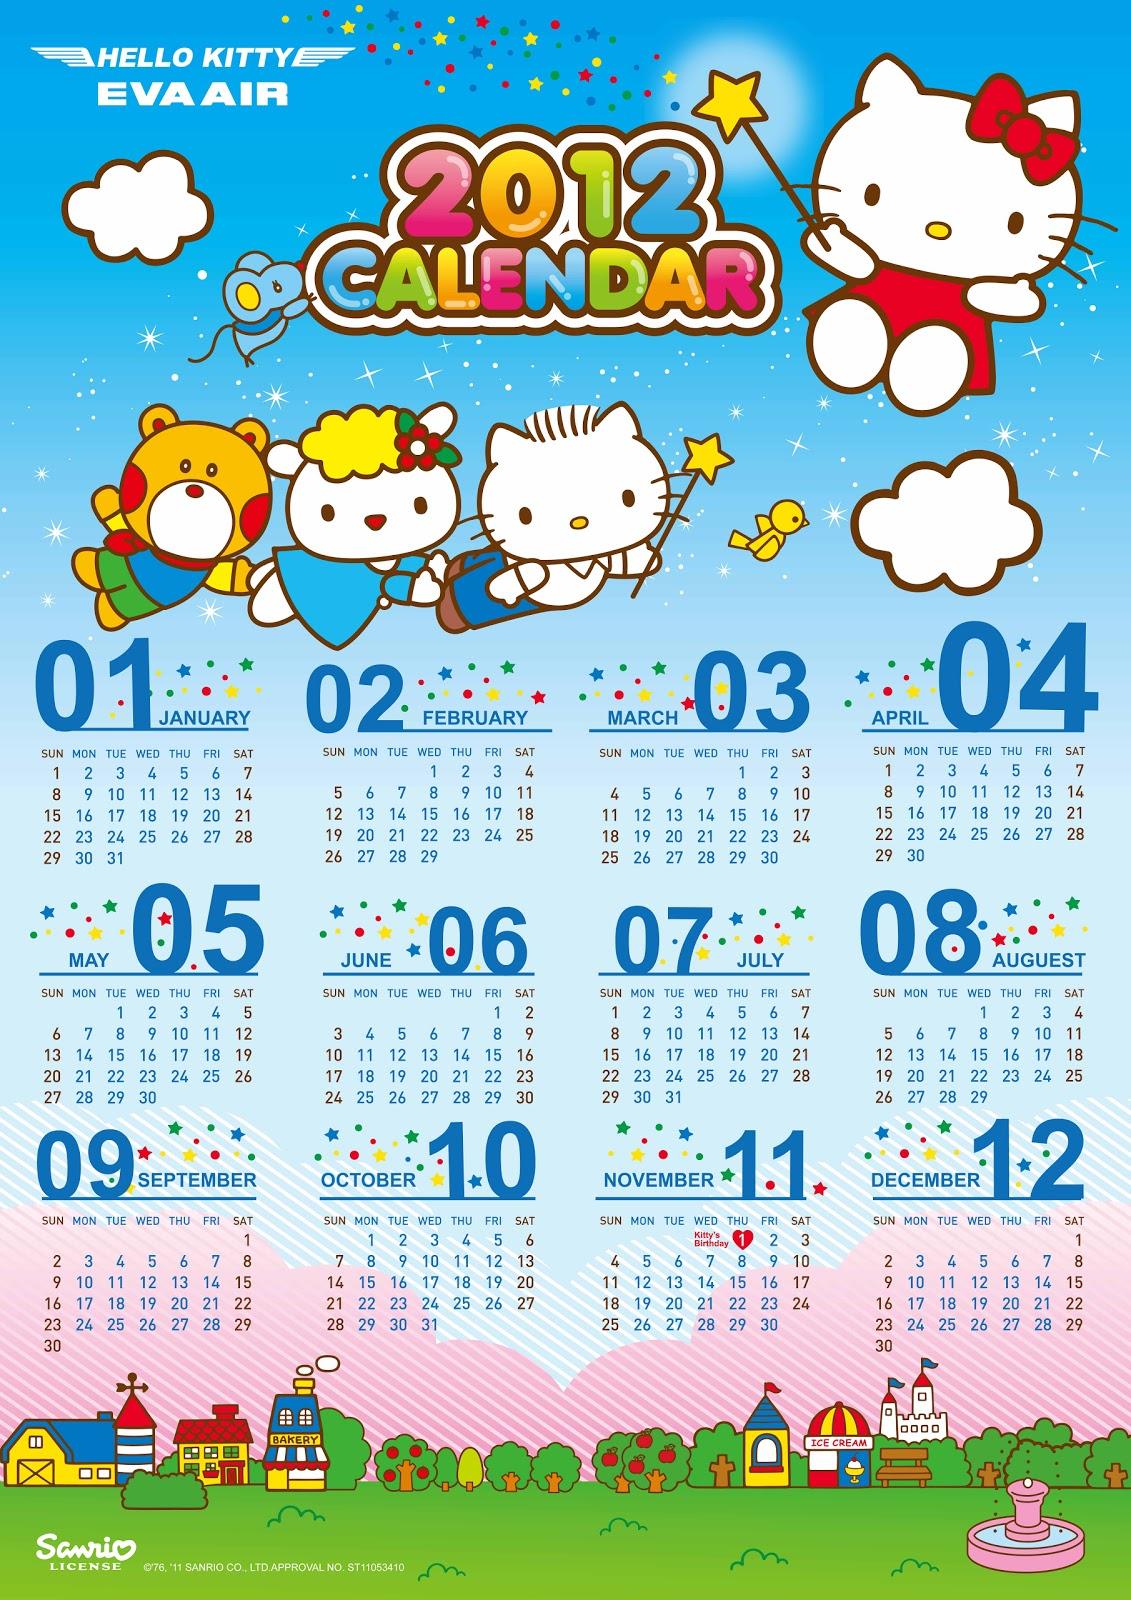 http://3.bp.blogspot.com/-bj5tYkerq-M/TwB9XFwGftI/AAAAAAAABeU/VRxPYdJ8AjM/s1600/hello-kitty-2012-calendar-eva-air.jpg